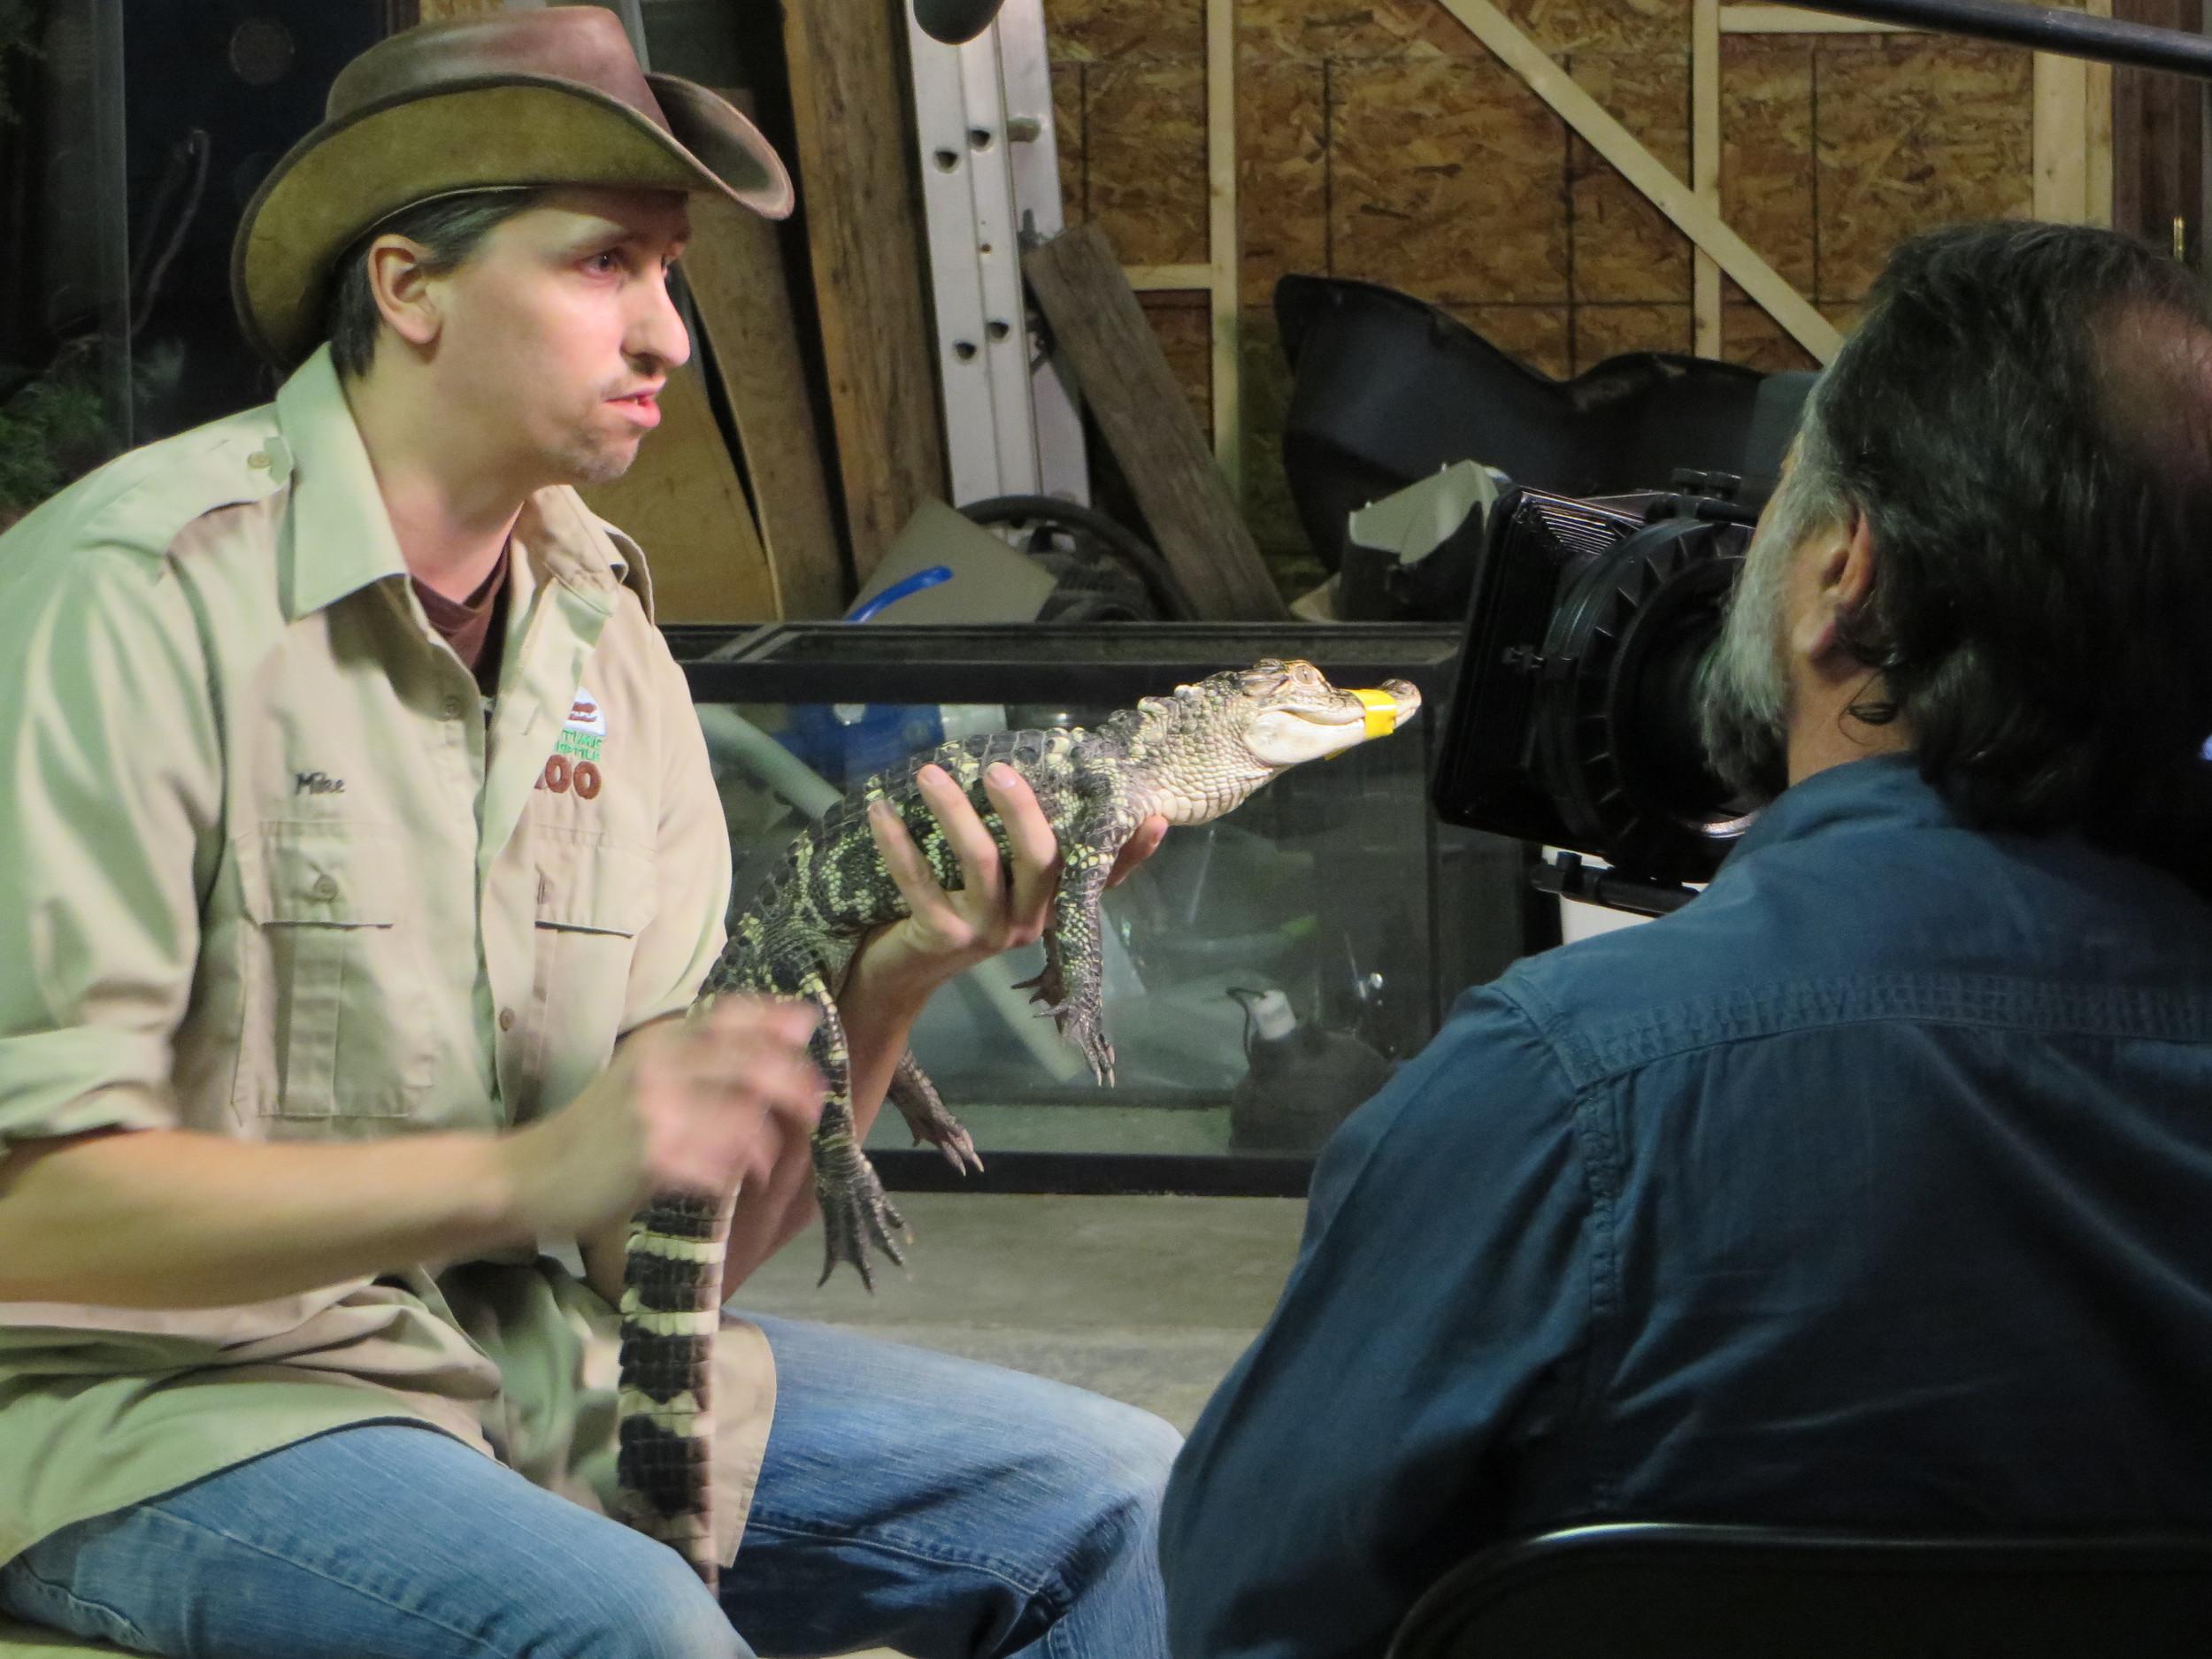 Mike MacDonald, curator at Maritime Reptile Zoo, with Ducky (Baby American Alligator), Nova Scotia - original.jpg